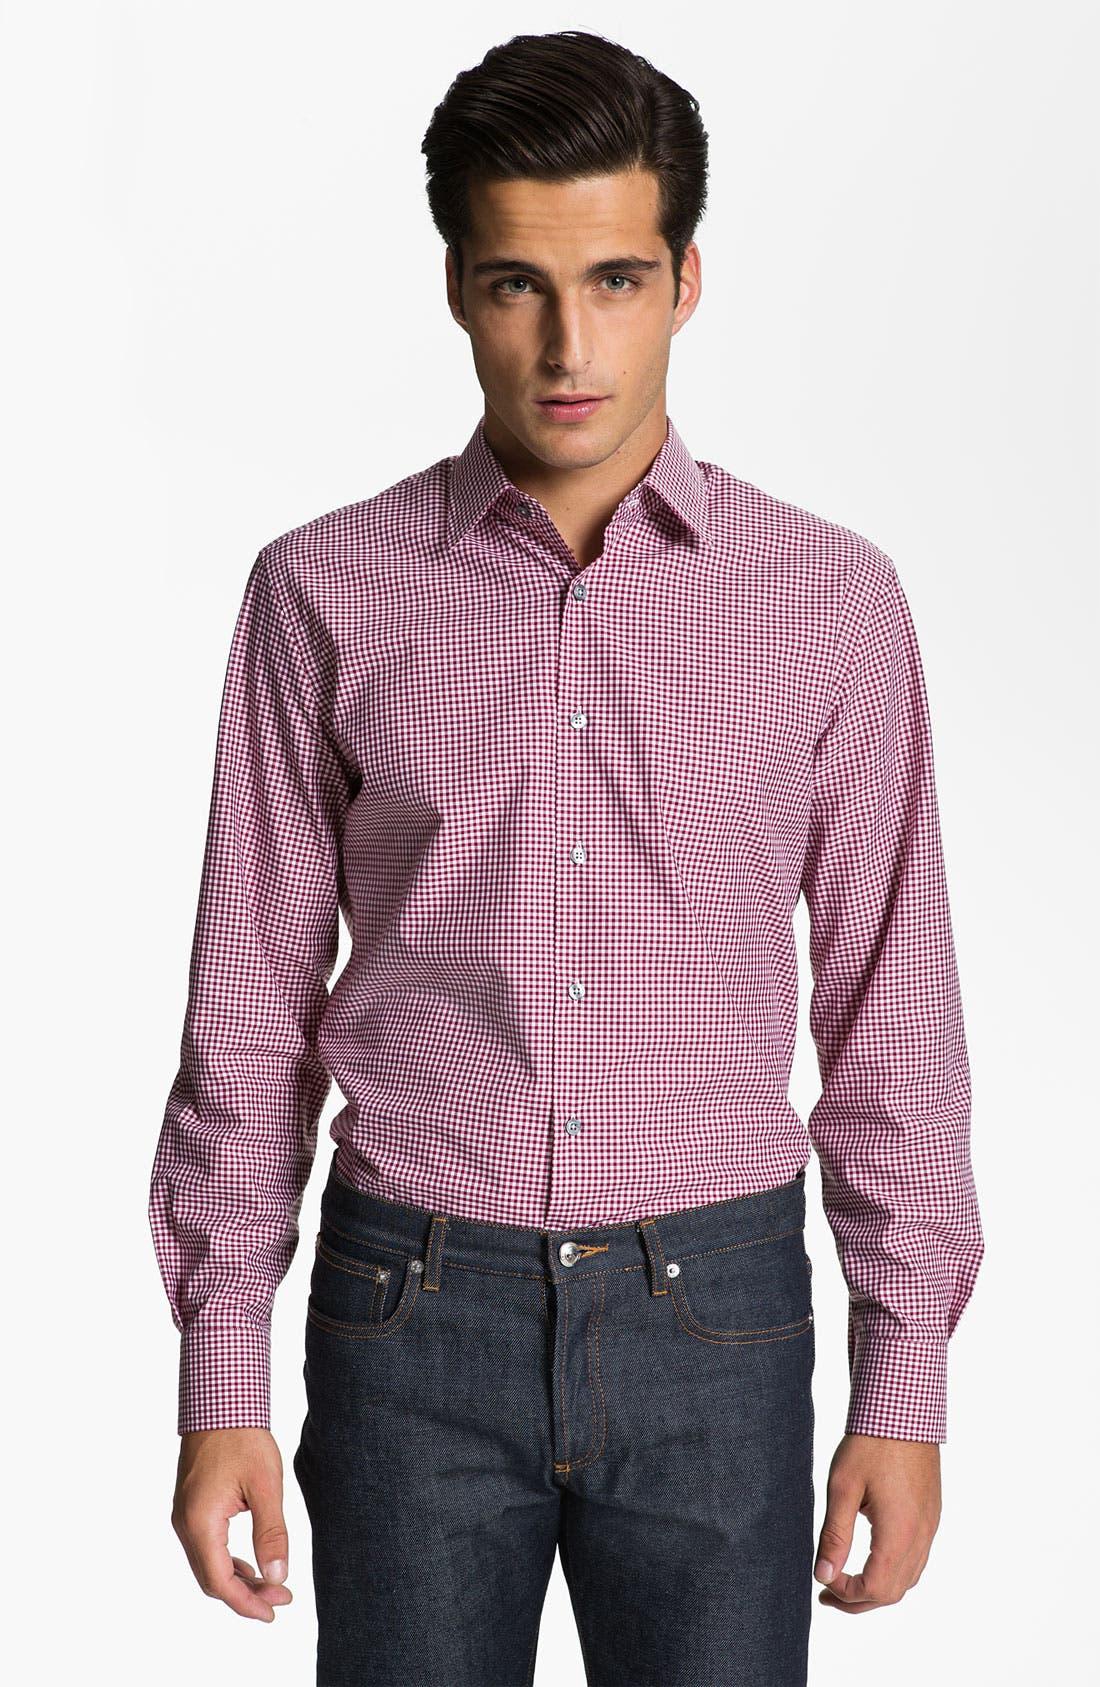 Alternate Image 1 Selected - Paul Smith London Check Print Dress Shirt